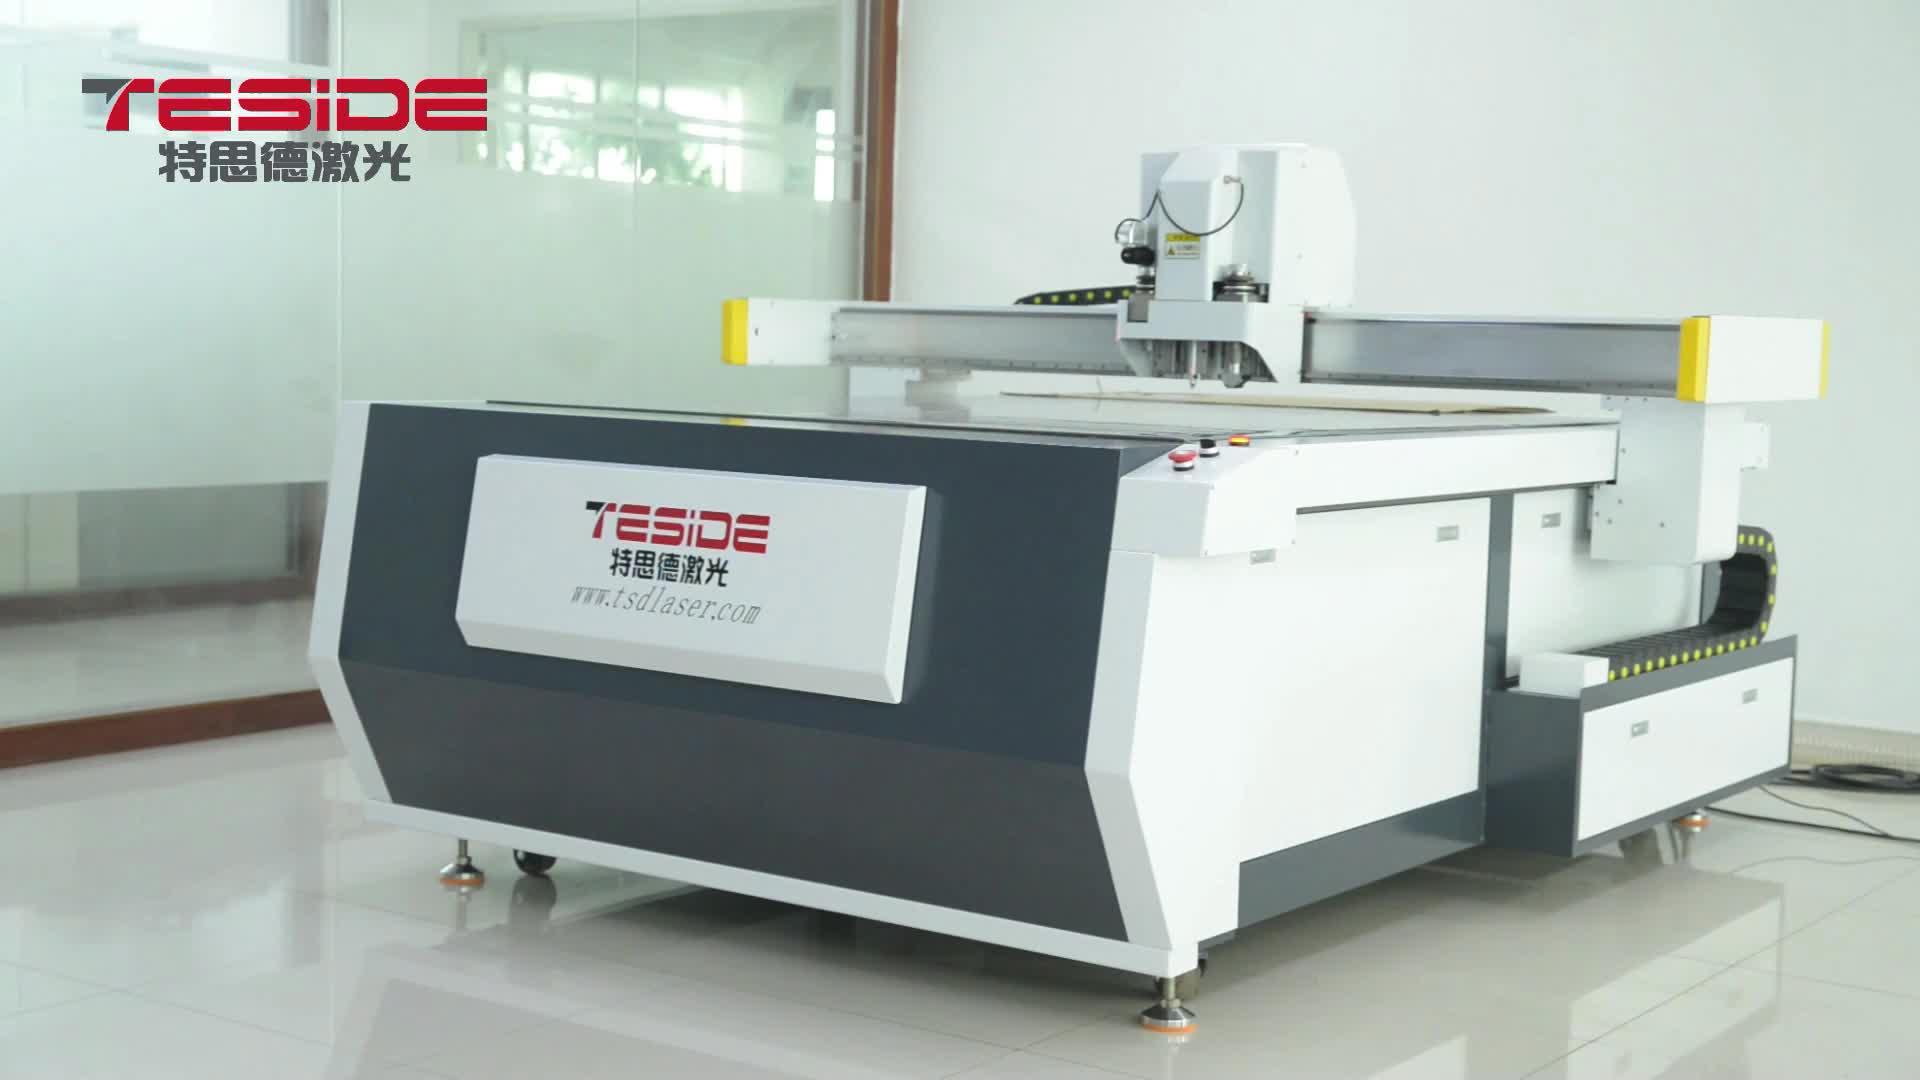 TSD-HC1310 Digital Draw Knife Pattern Cutting Machine for Corrugated Carton Cutting